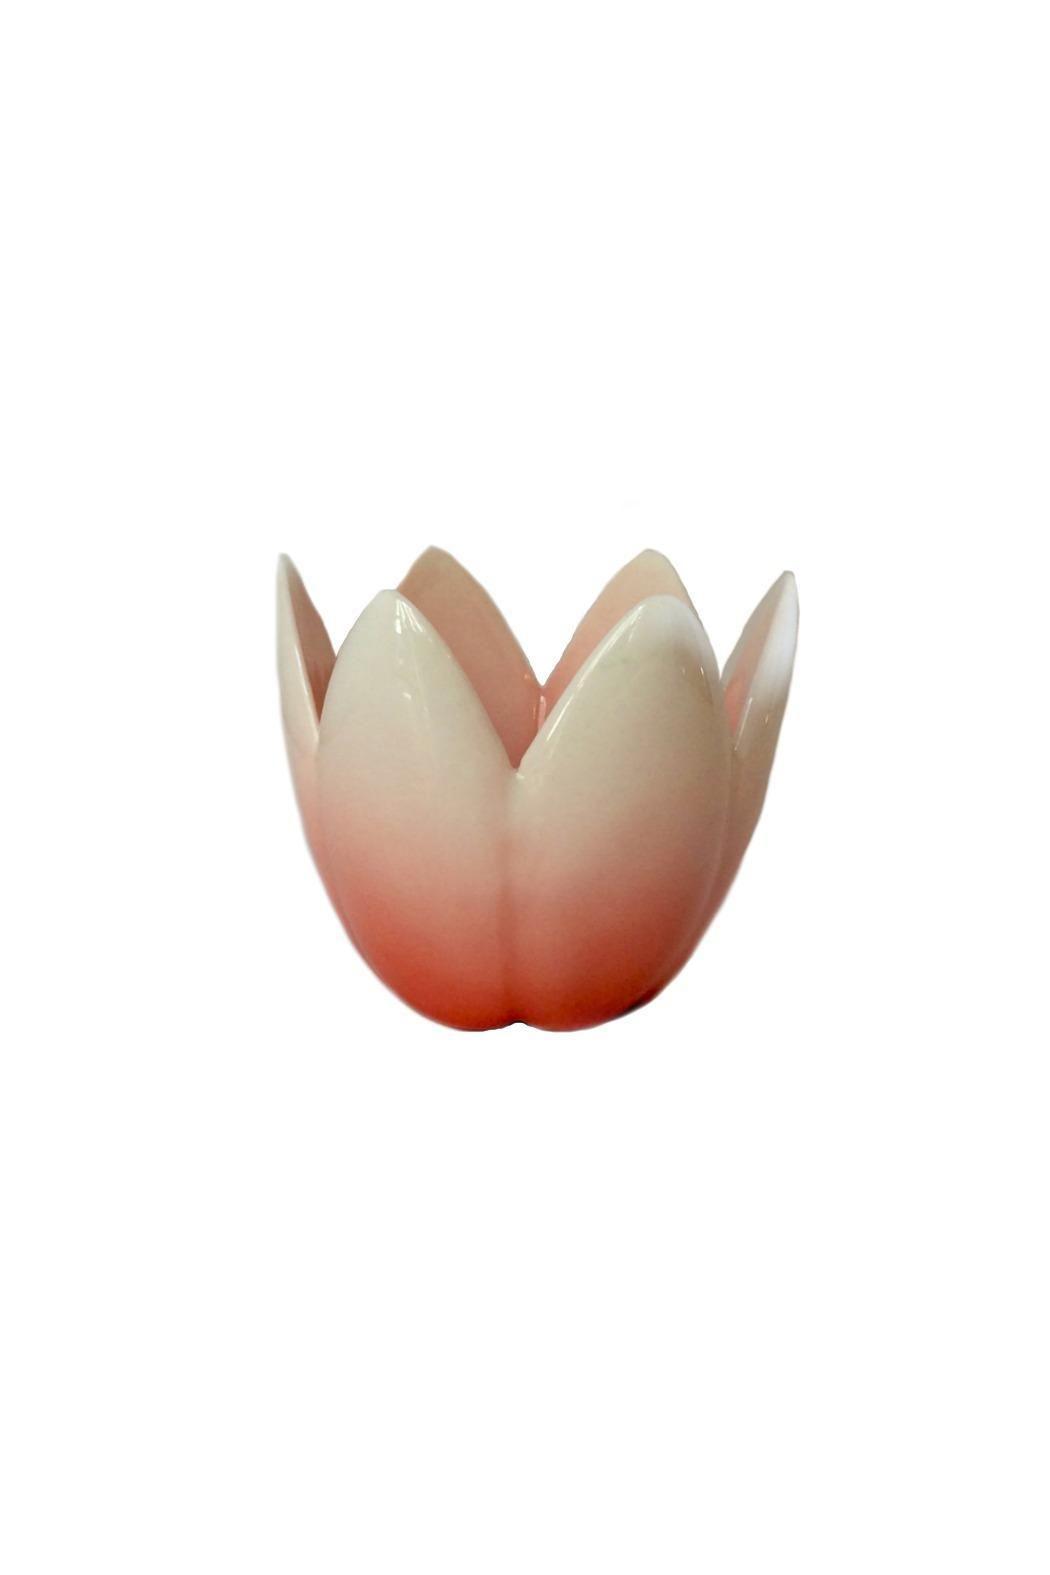 Alessi lotus small bowl lotus lotus flower and shapes lotus small bowl izmirmasajfo